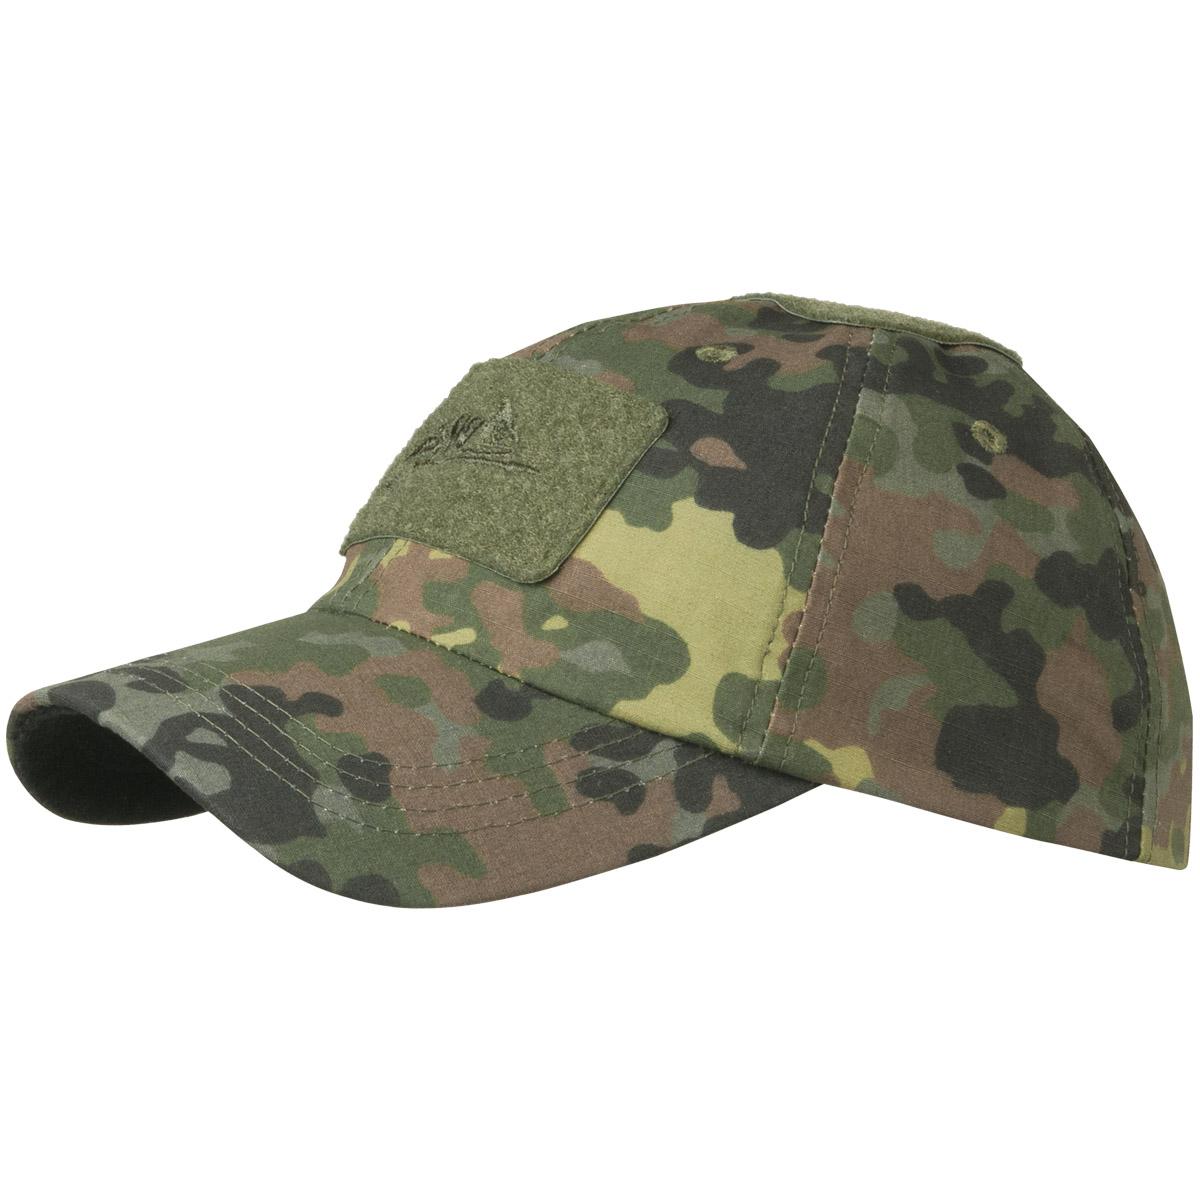 Sentinel Helikon Tactical Mens Baseball Cap Army Combat Patrol Uniform Hat  Flecktarn Camo fd48ee14008b